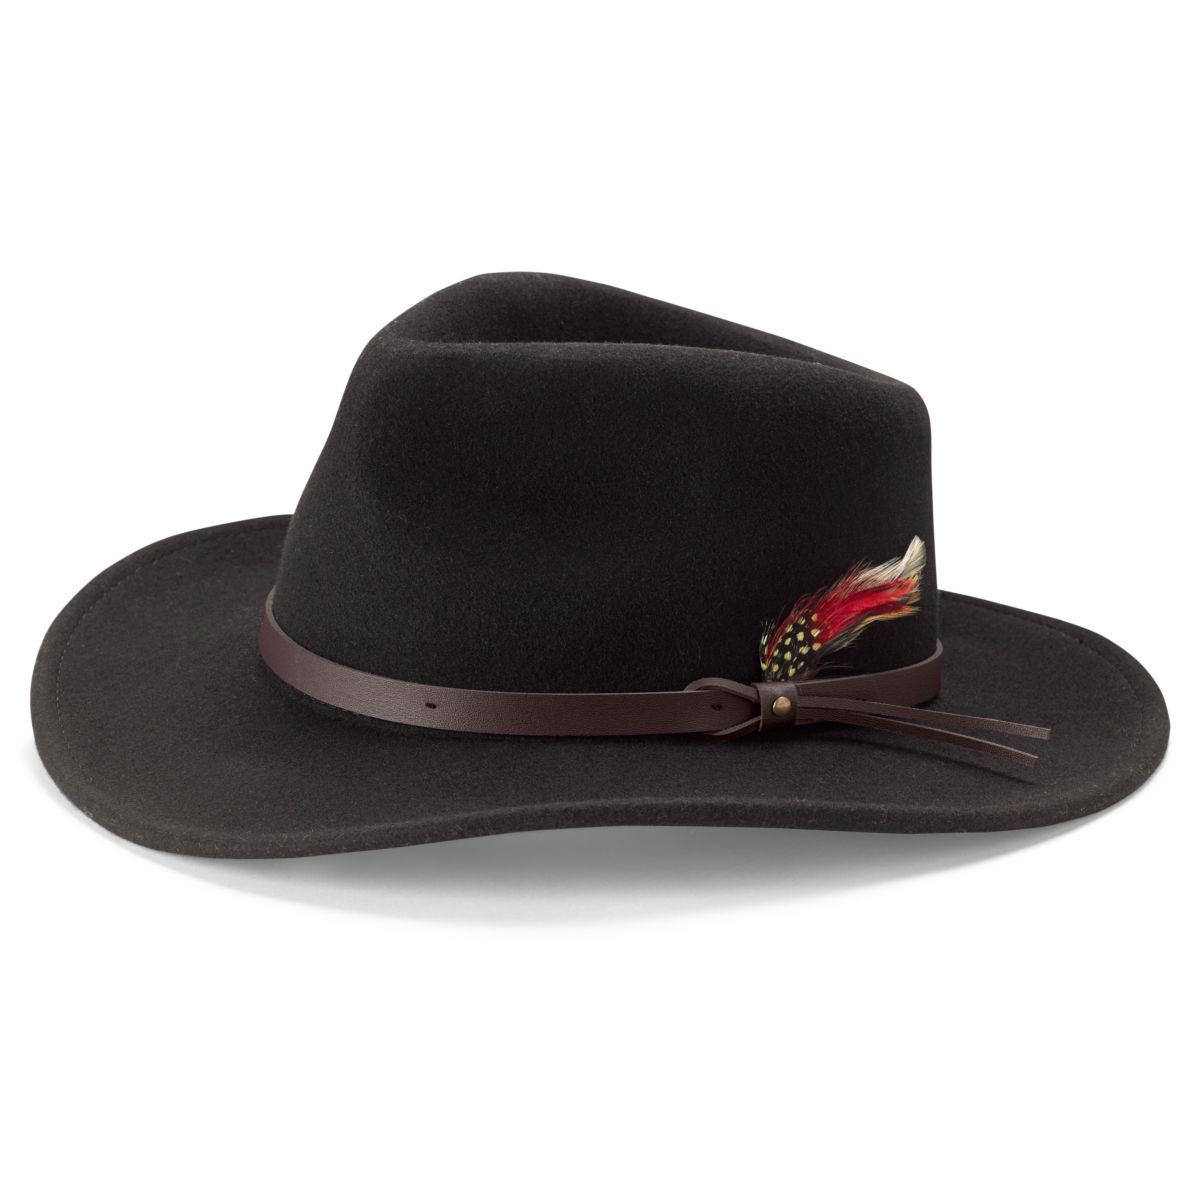 Red Feather Crushable Felt Hat - BLACKimage number 0